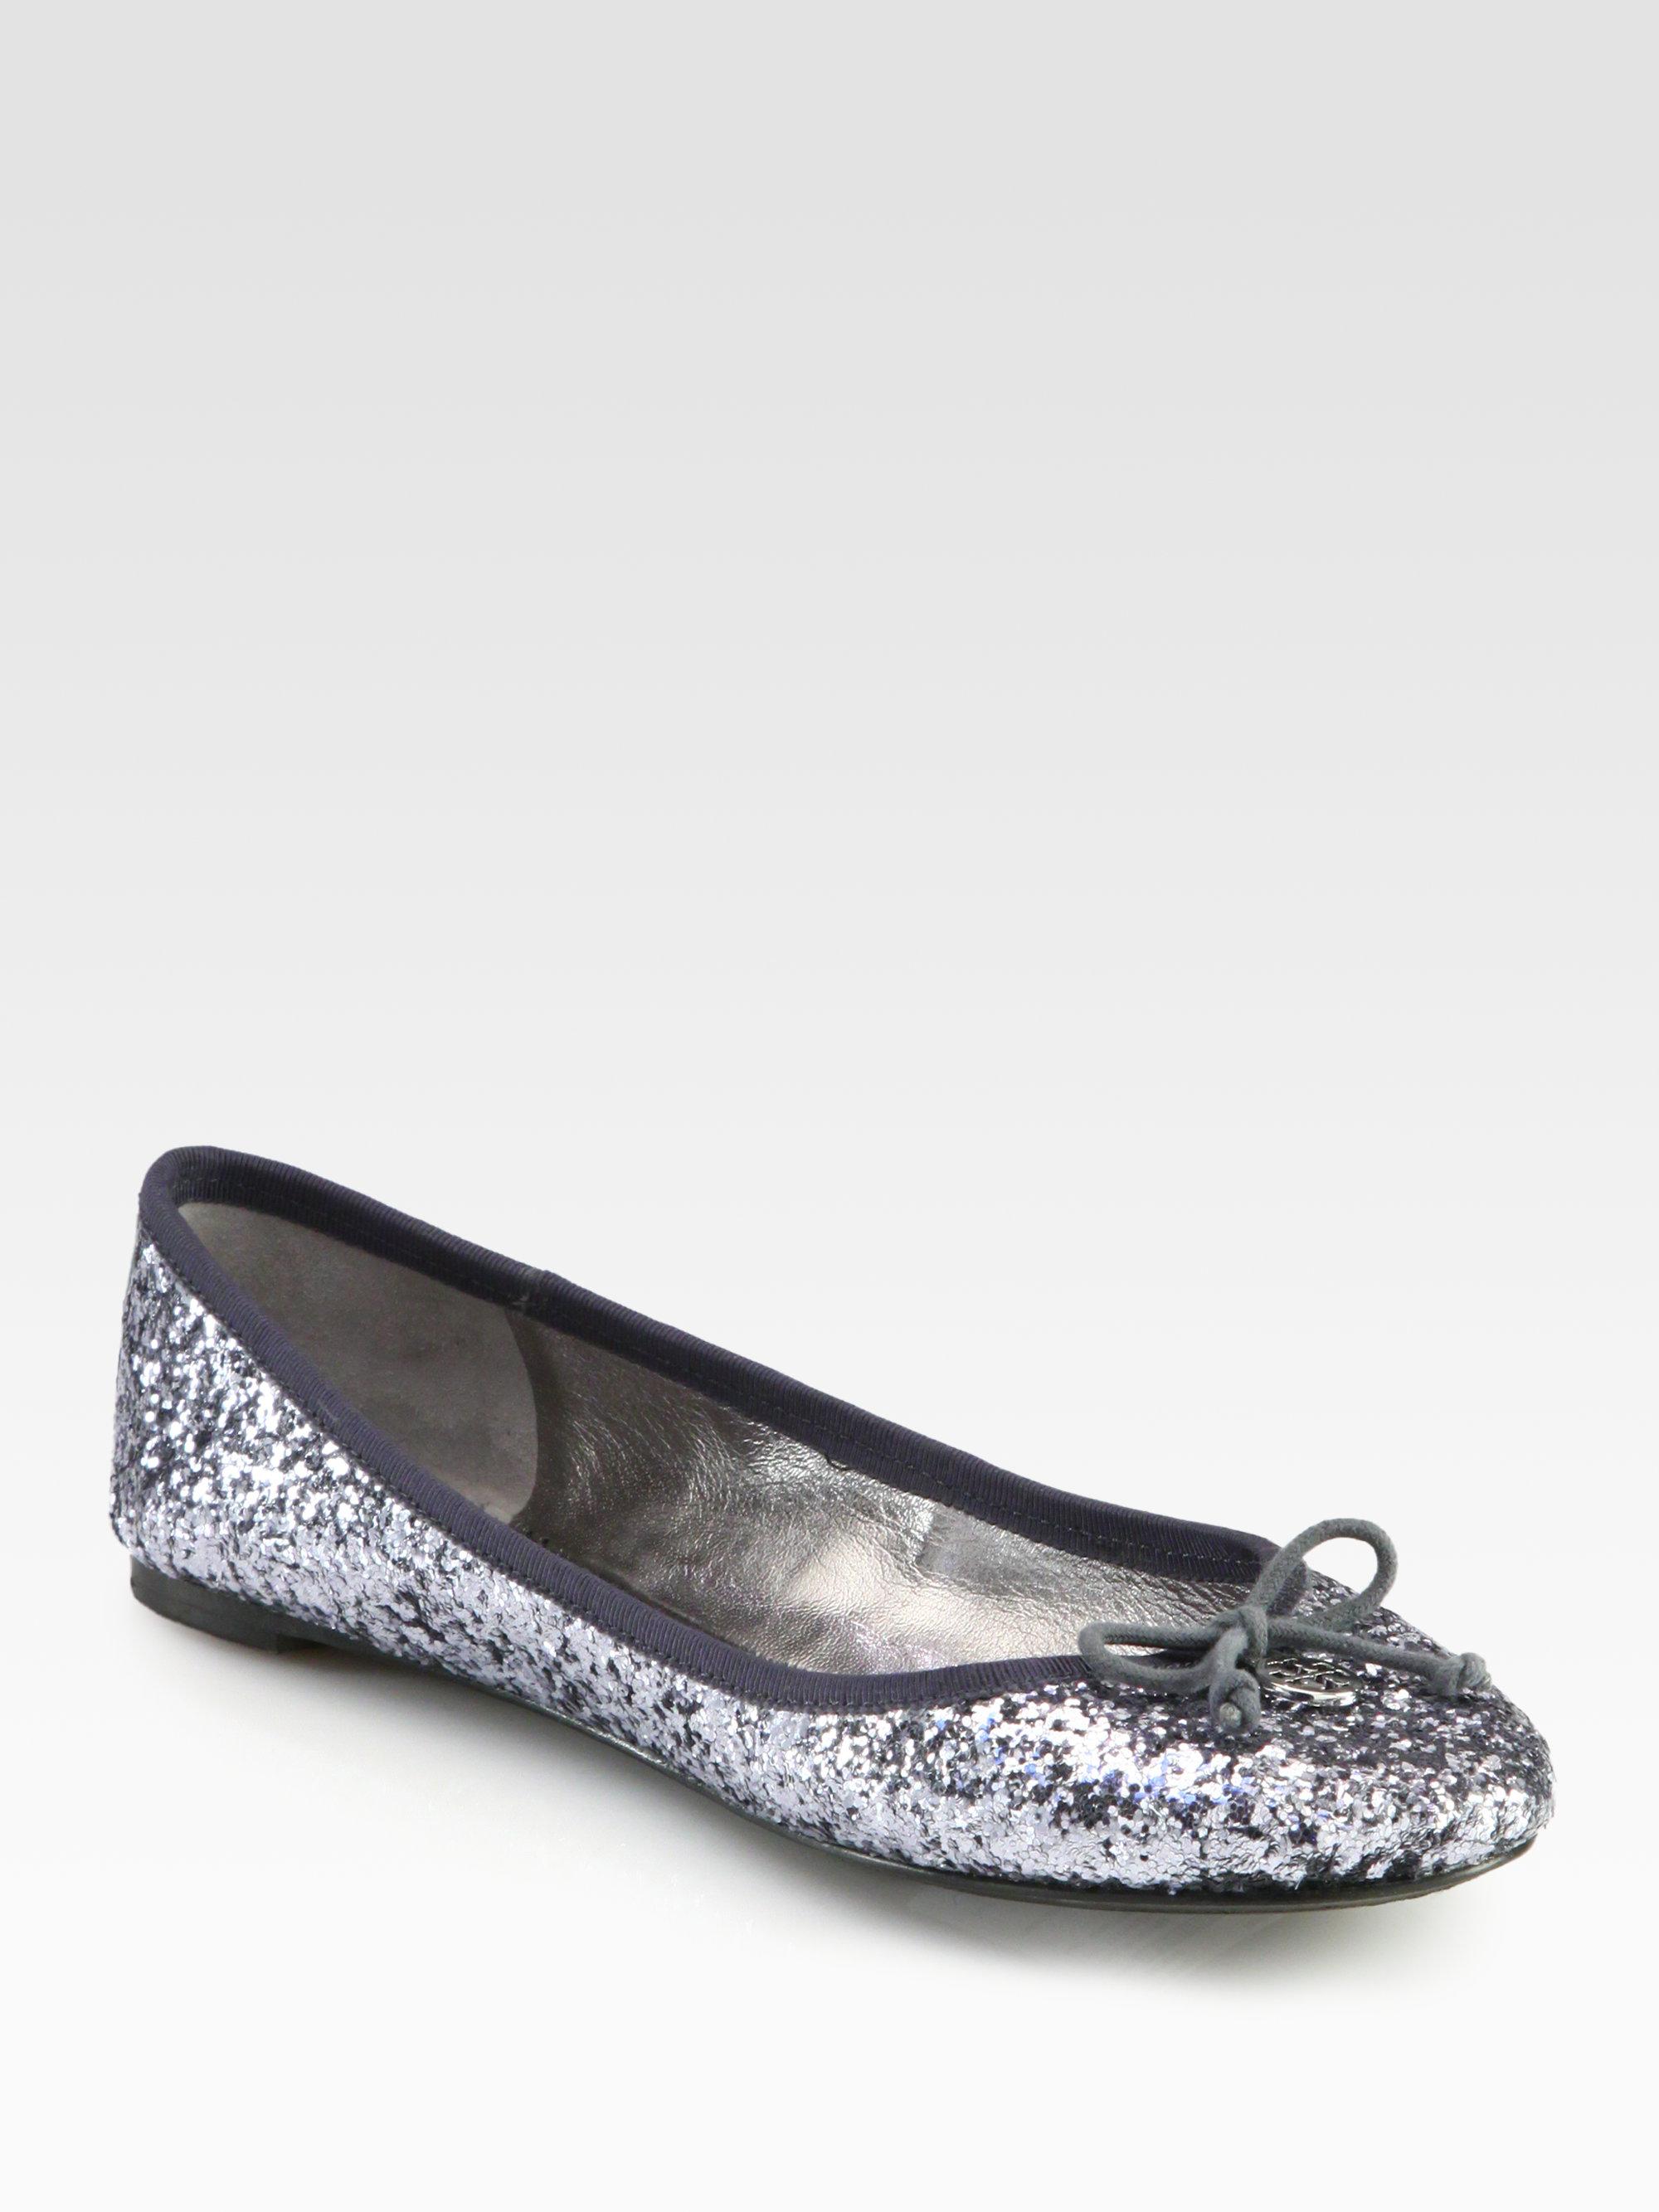 9643819b1d4f Tory Burch Chelsea Glitter Ballet Flats in Metallic - Lyst